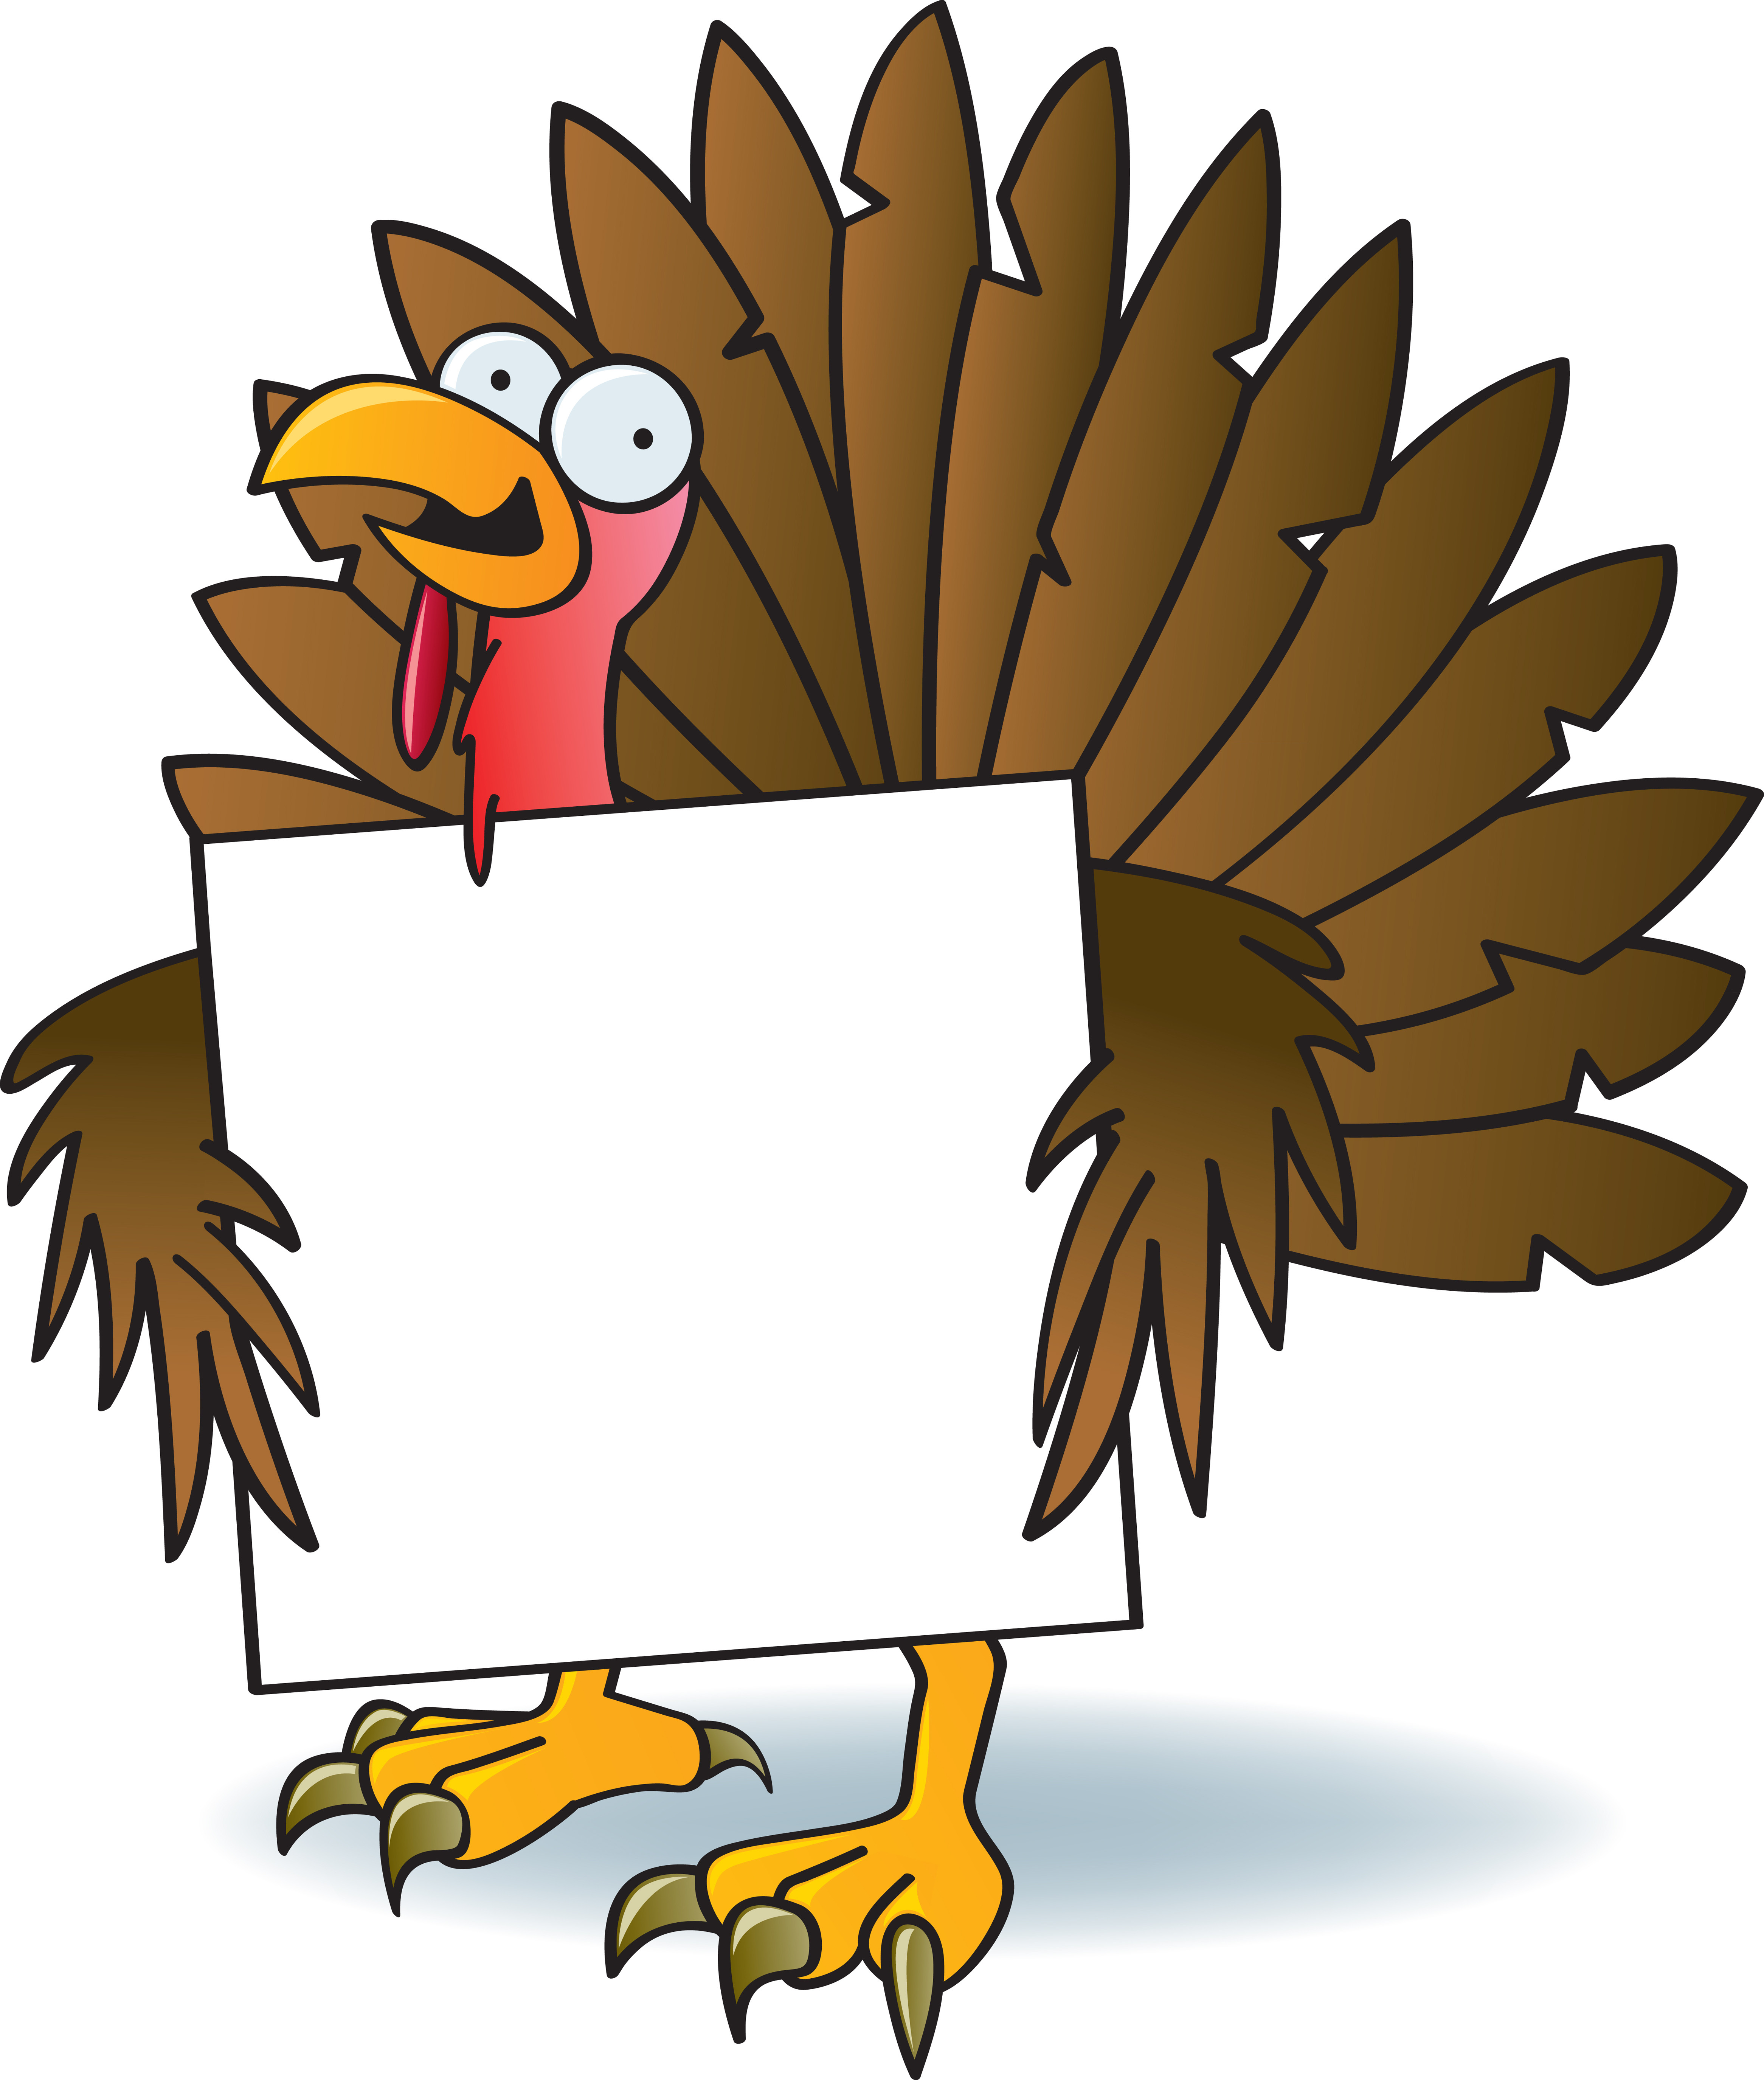 Turkey Cartoon Thanksgiving  Illustration Vector by Jamie Slavy at Coroflot